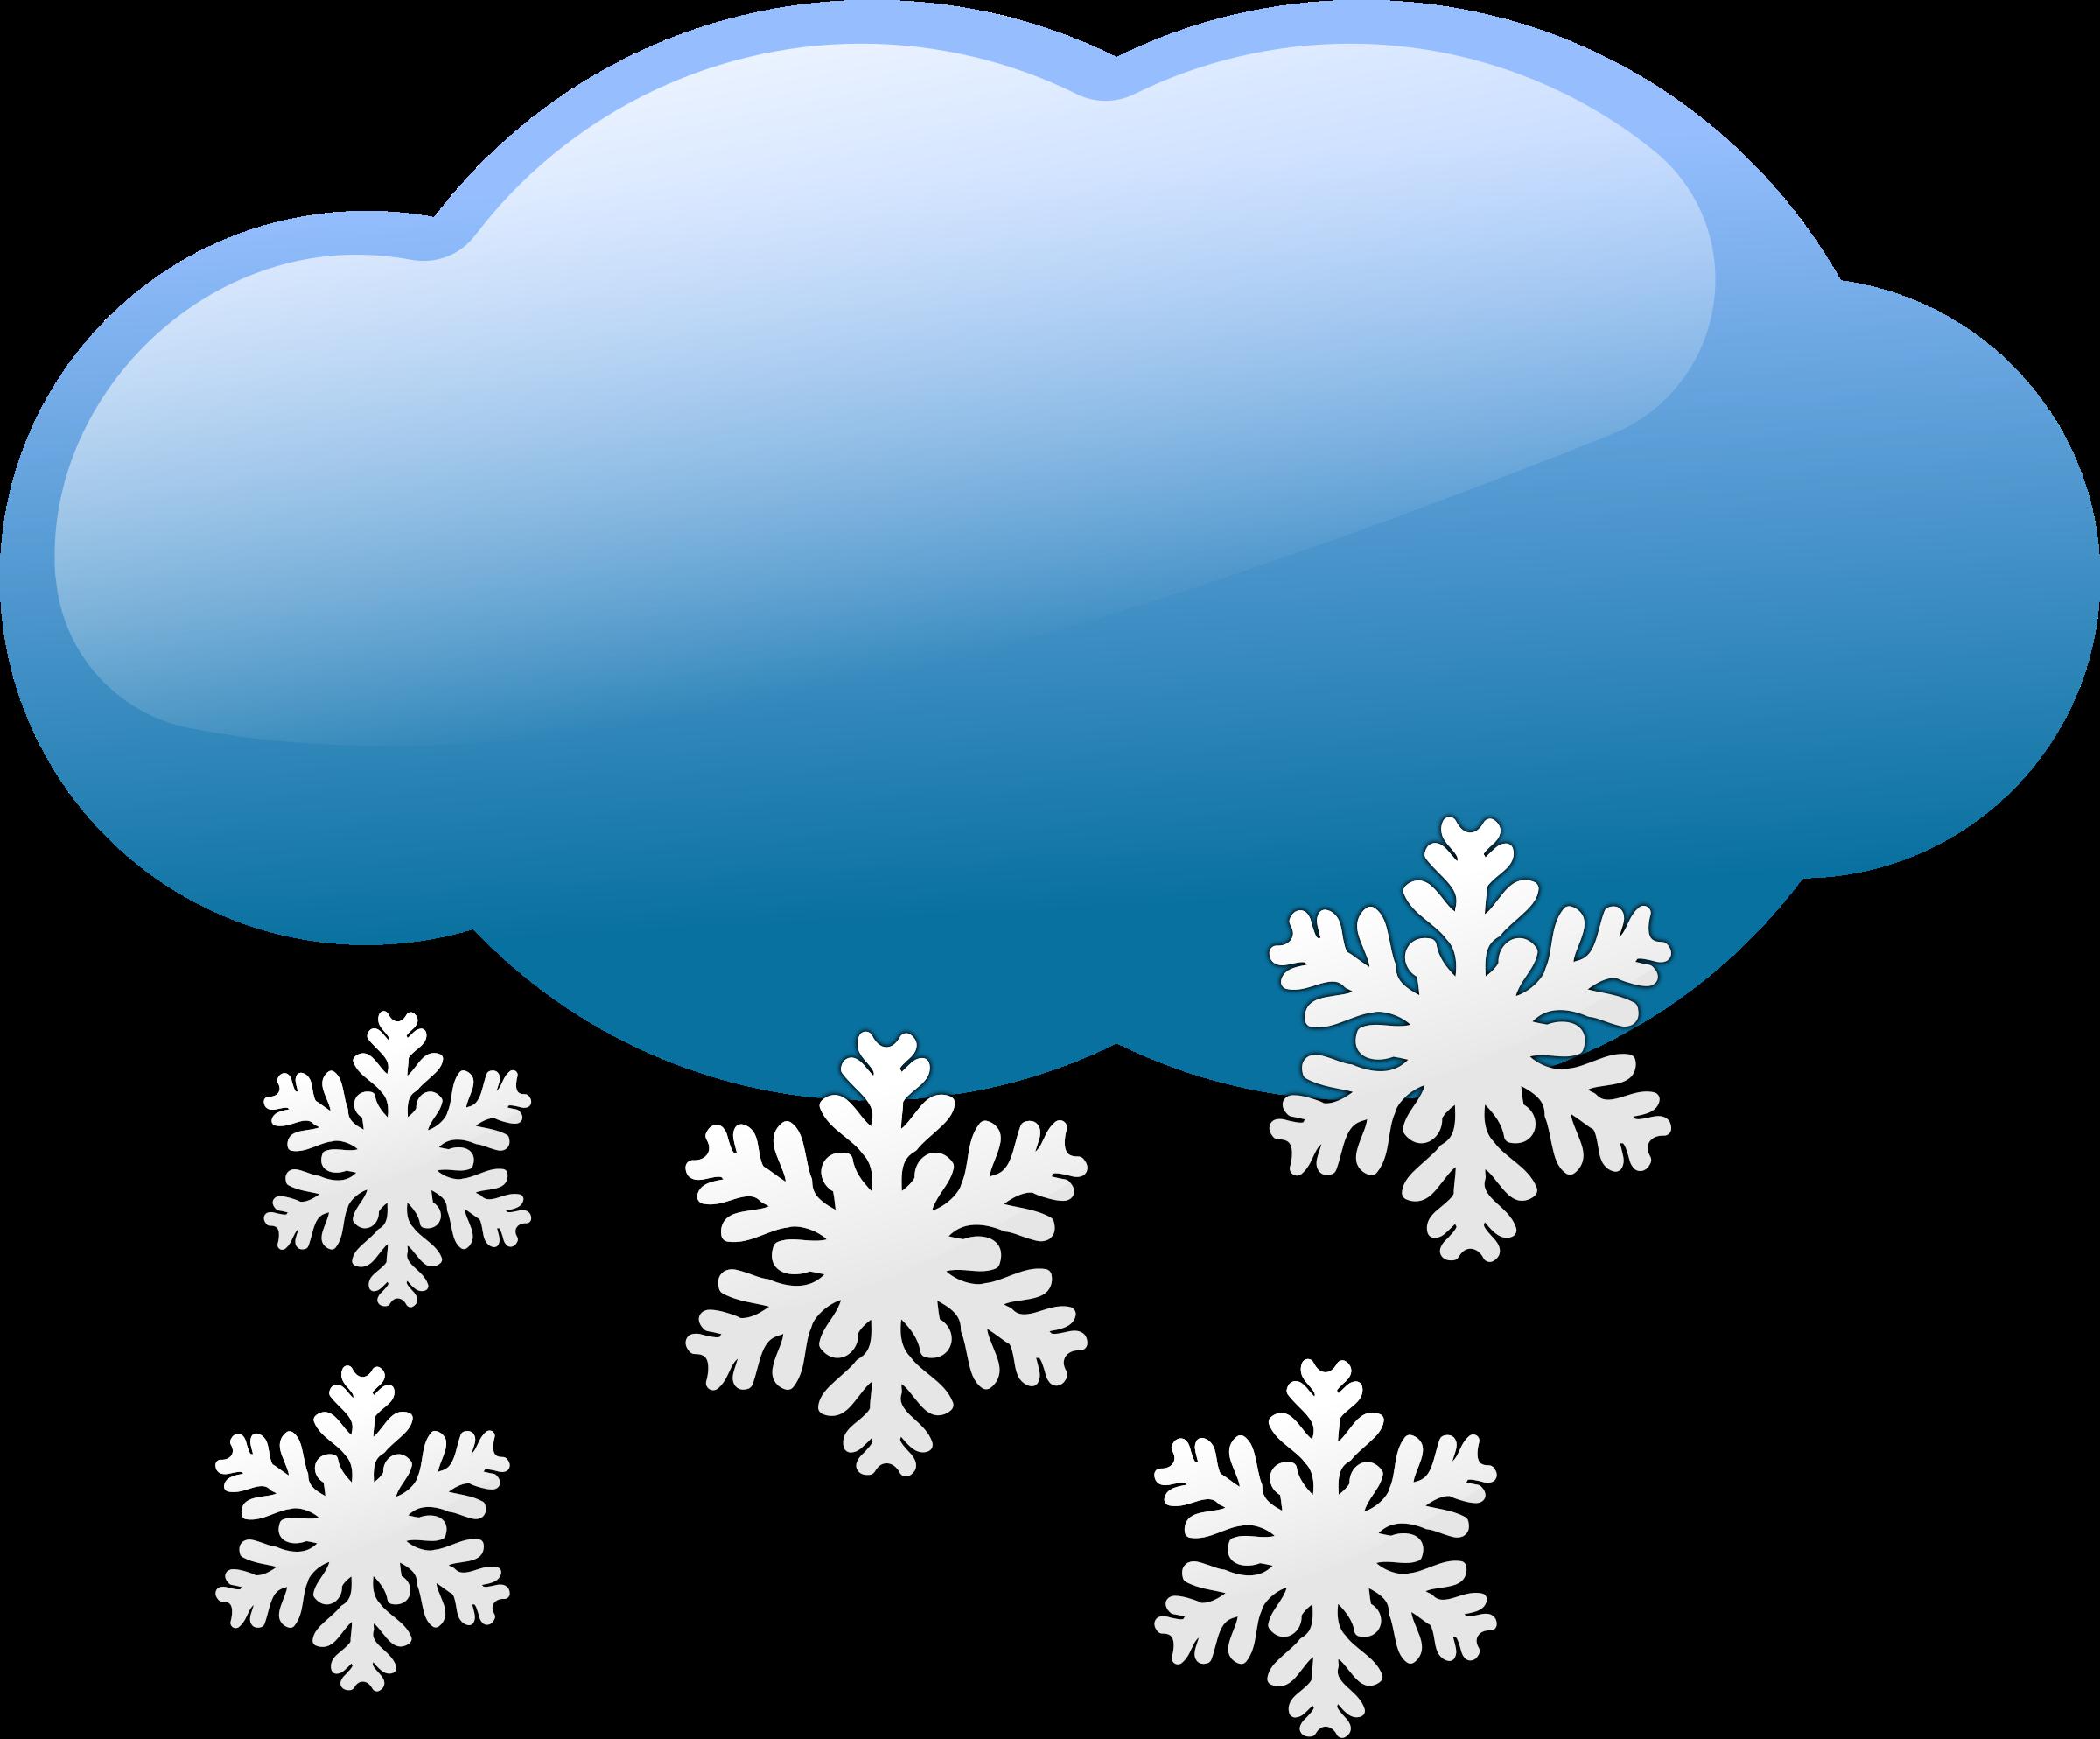 Symbols big image png. Cloud clipart weather